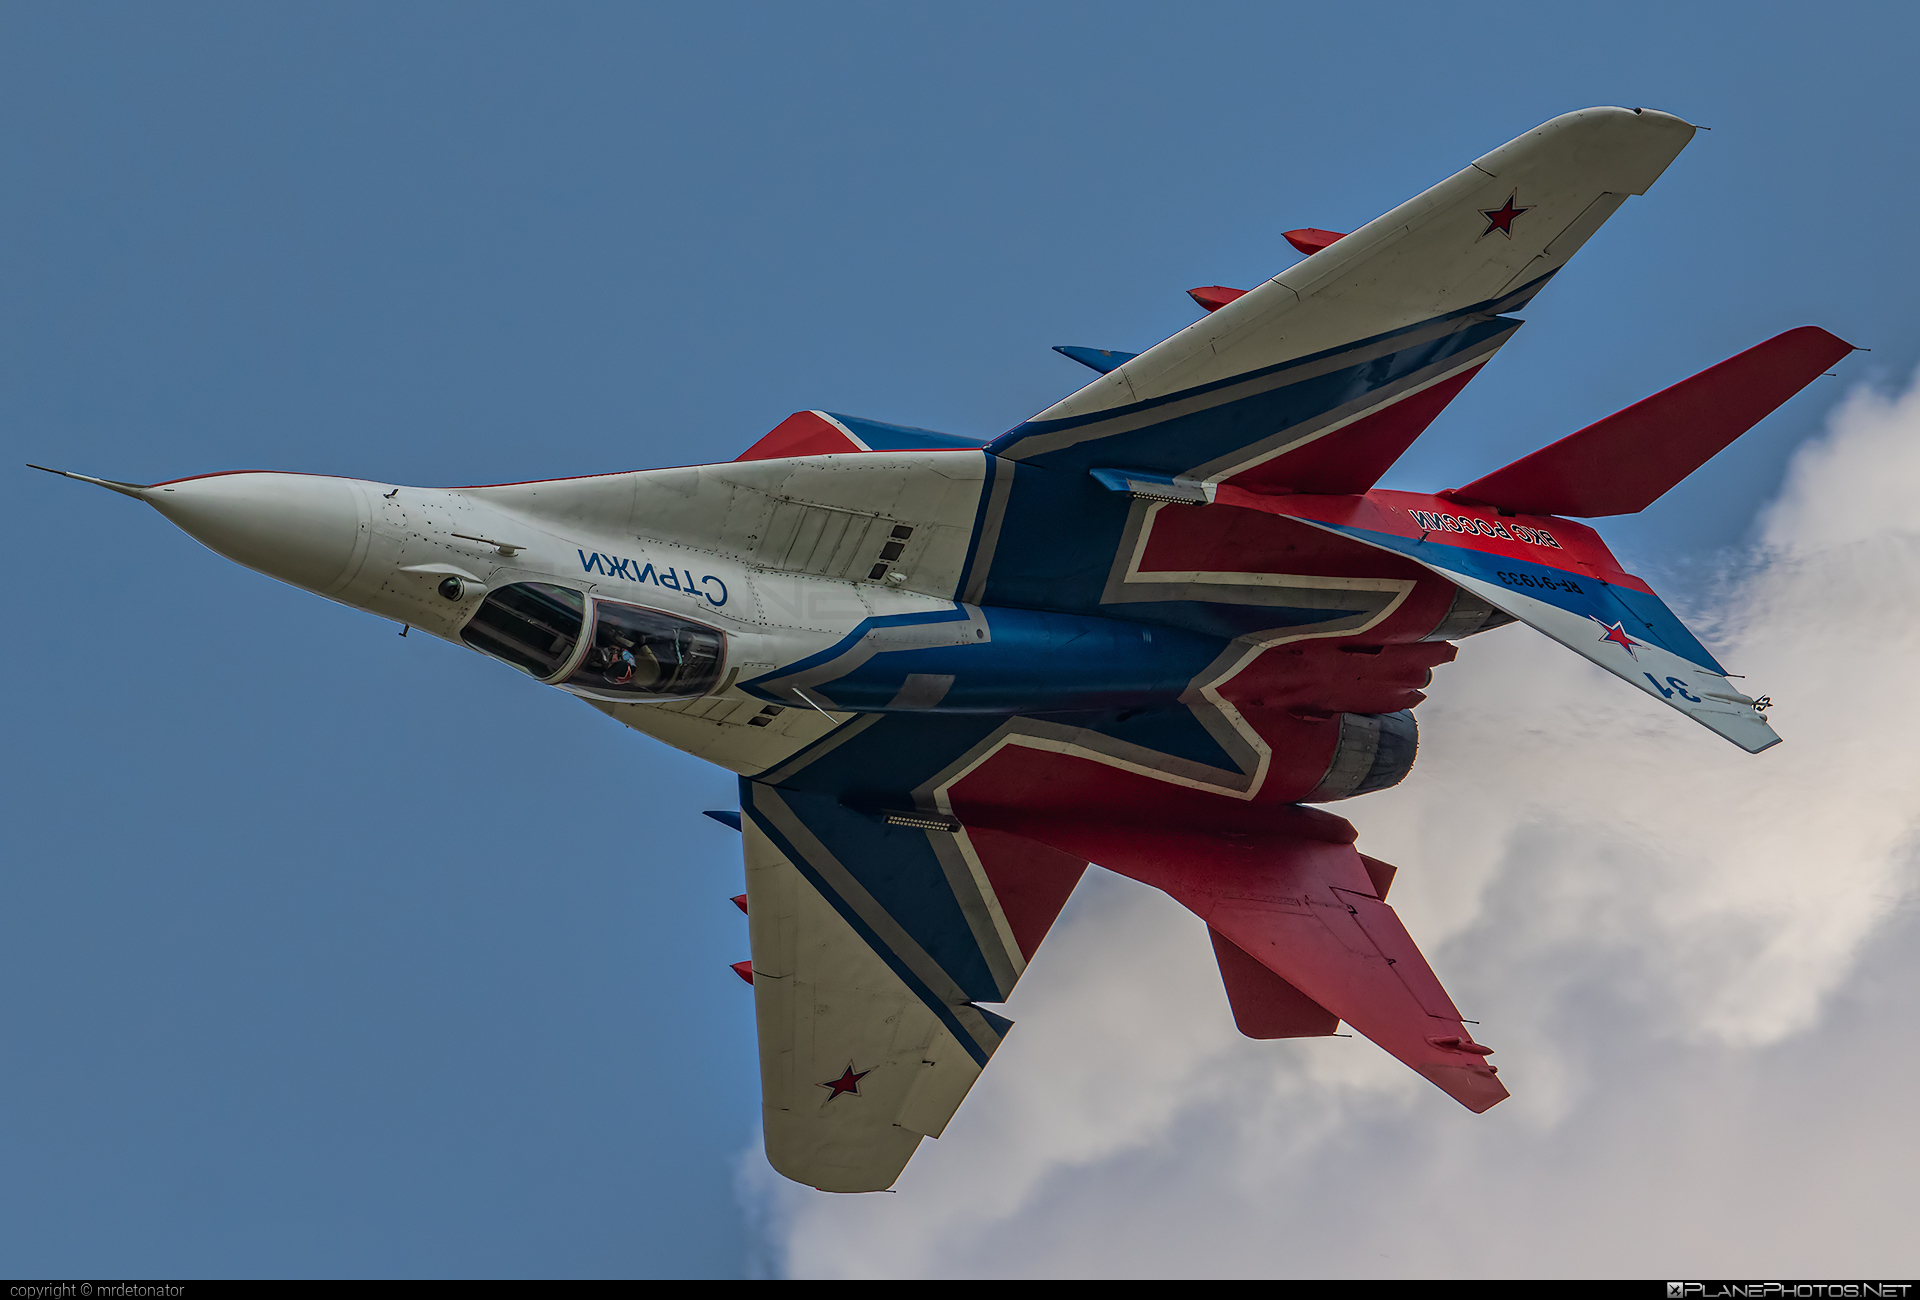 Mikoyan-Gurevich MiG-29S - RF-91933 operated by Vozdushno-kosmicheskiye sily Rossii (Russian Aerospace Forces) #maks2019 #mig #mig29 #mig29s #mikoyangurevich #russianaerospaceforces #vozdushnokosmicheskiyesilyrossii